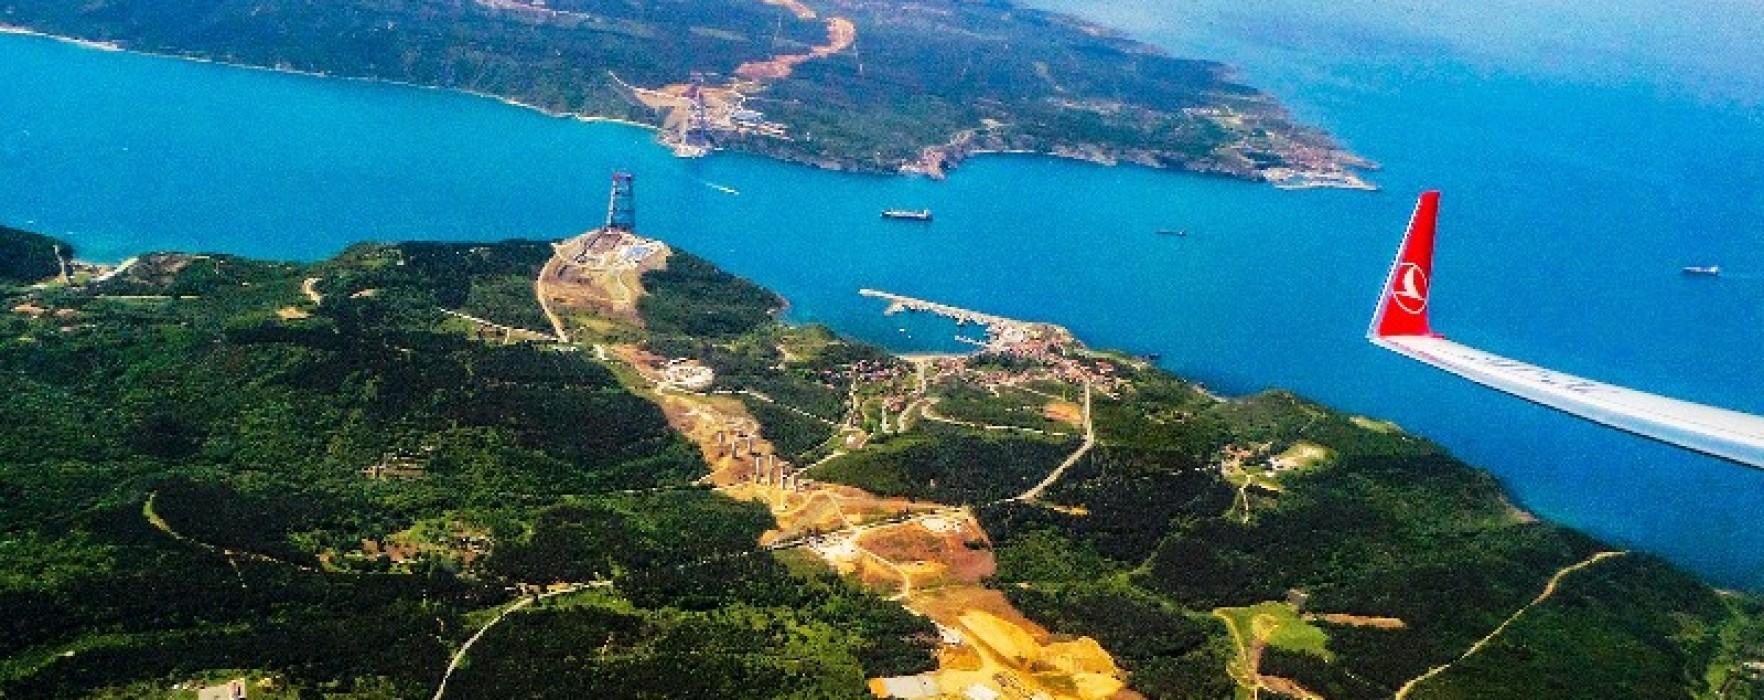 İstanbul Karadeniz'i de mi yutacak?